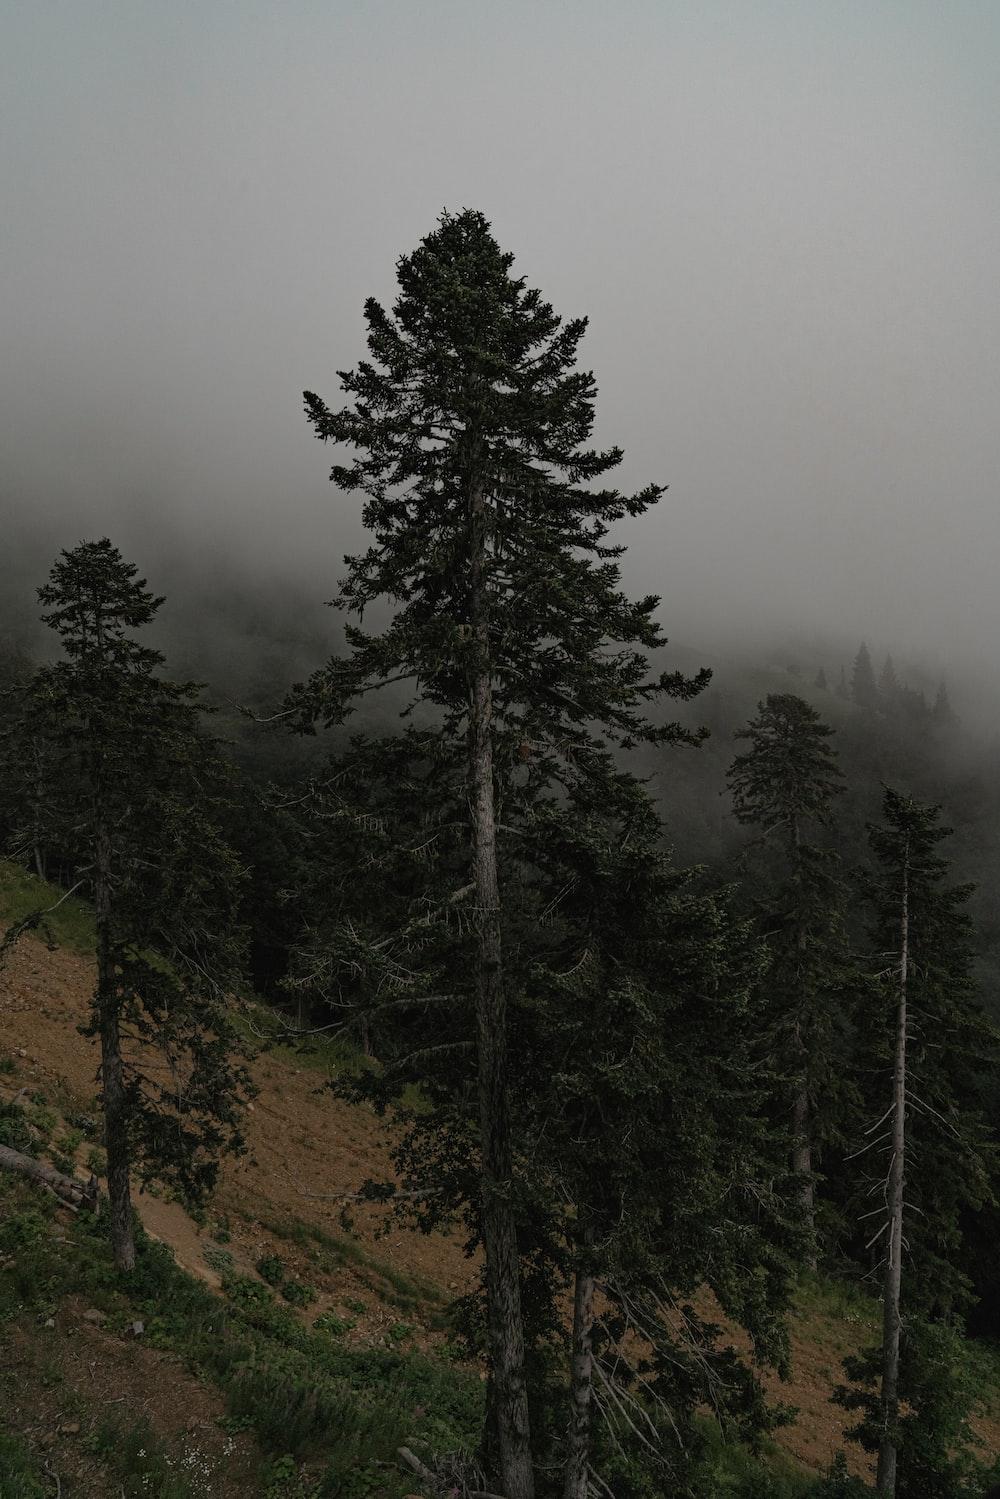 green pine tree on brown field